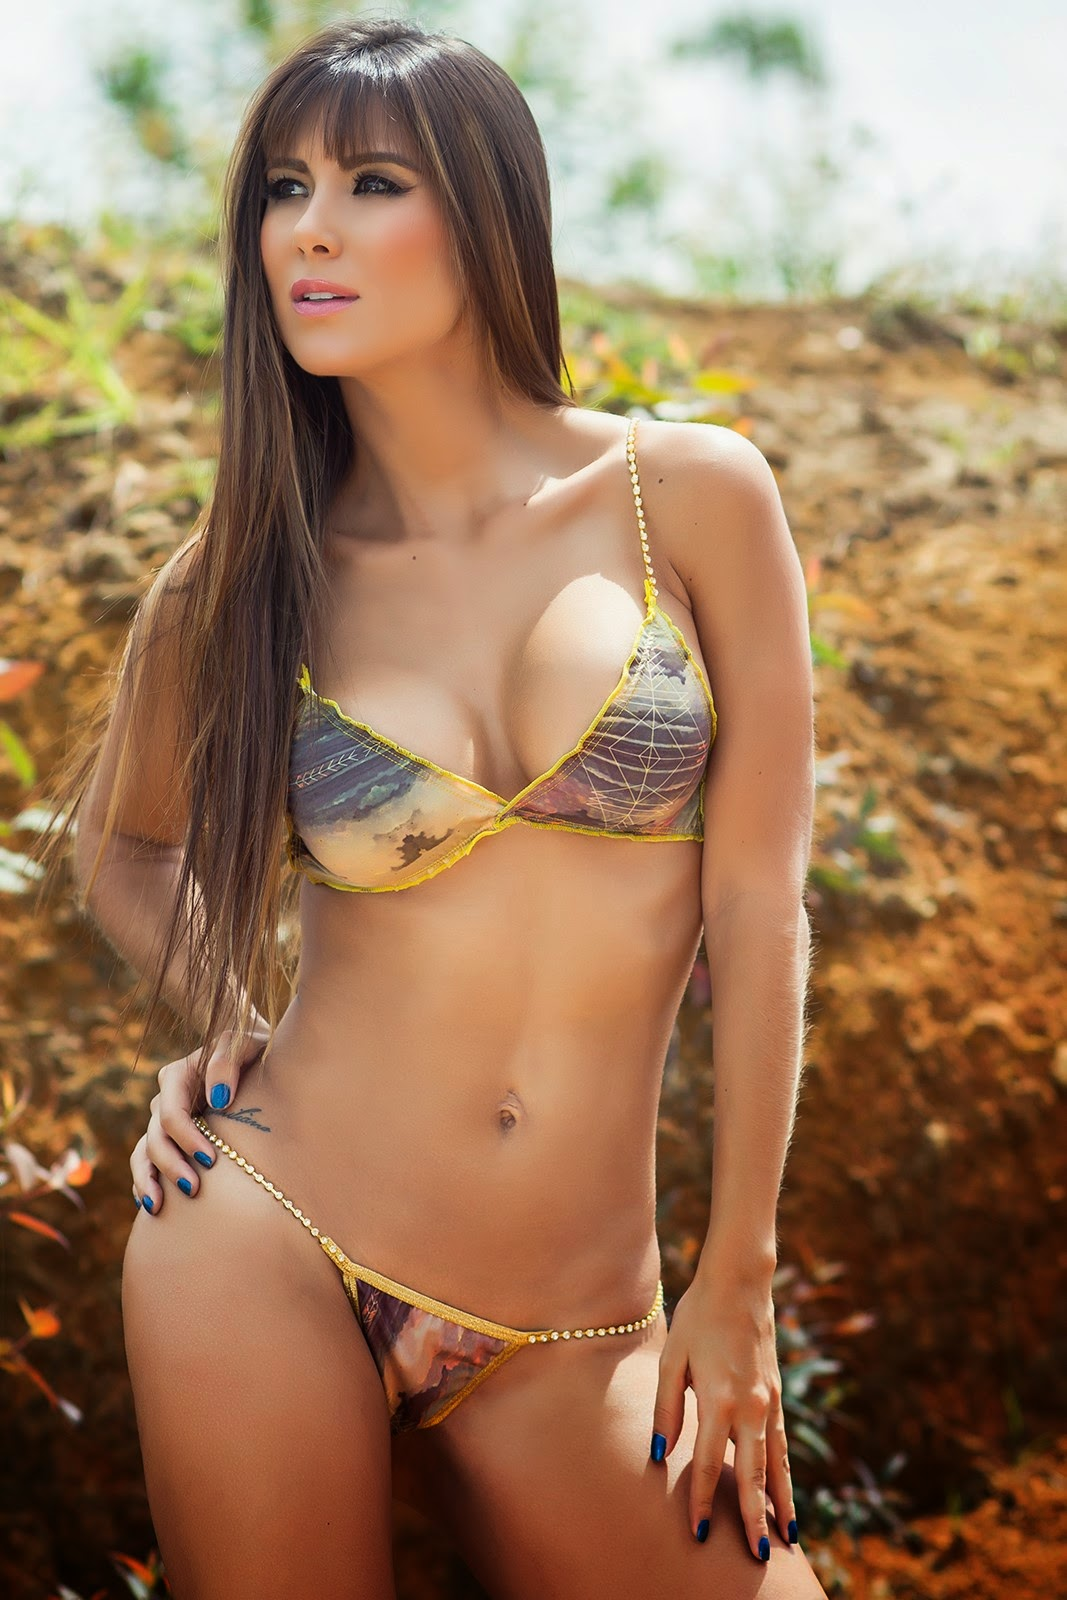 Nude naiset sharking gif-8253